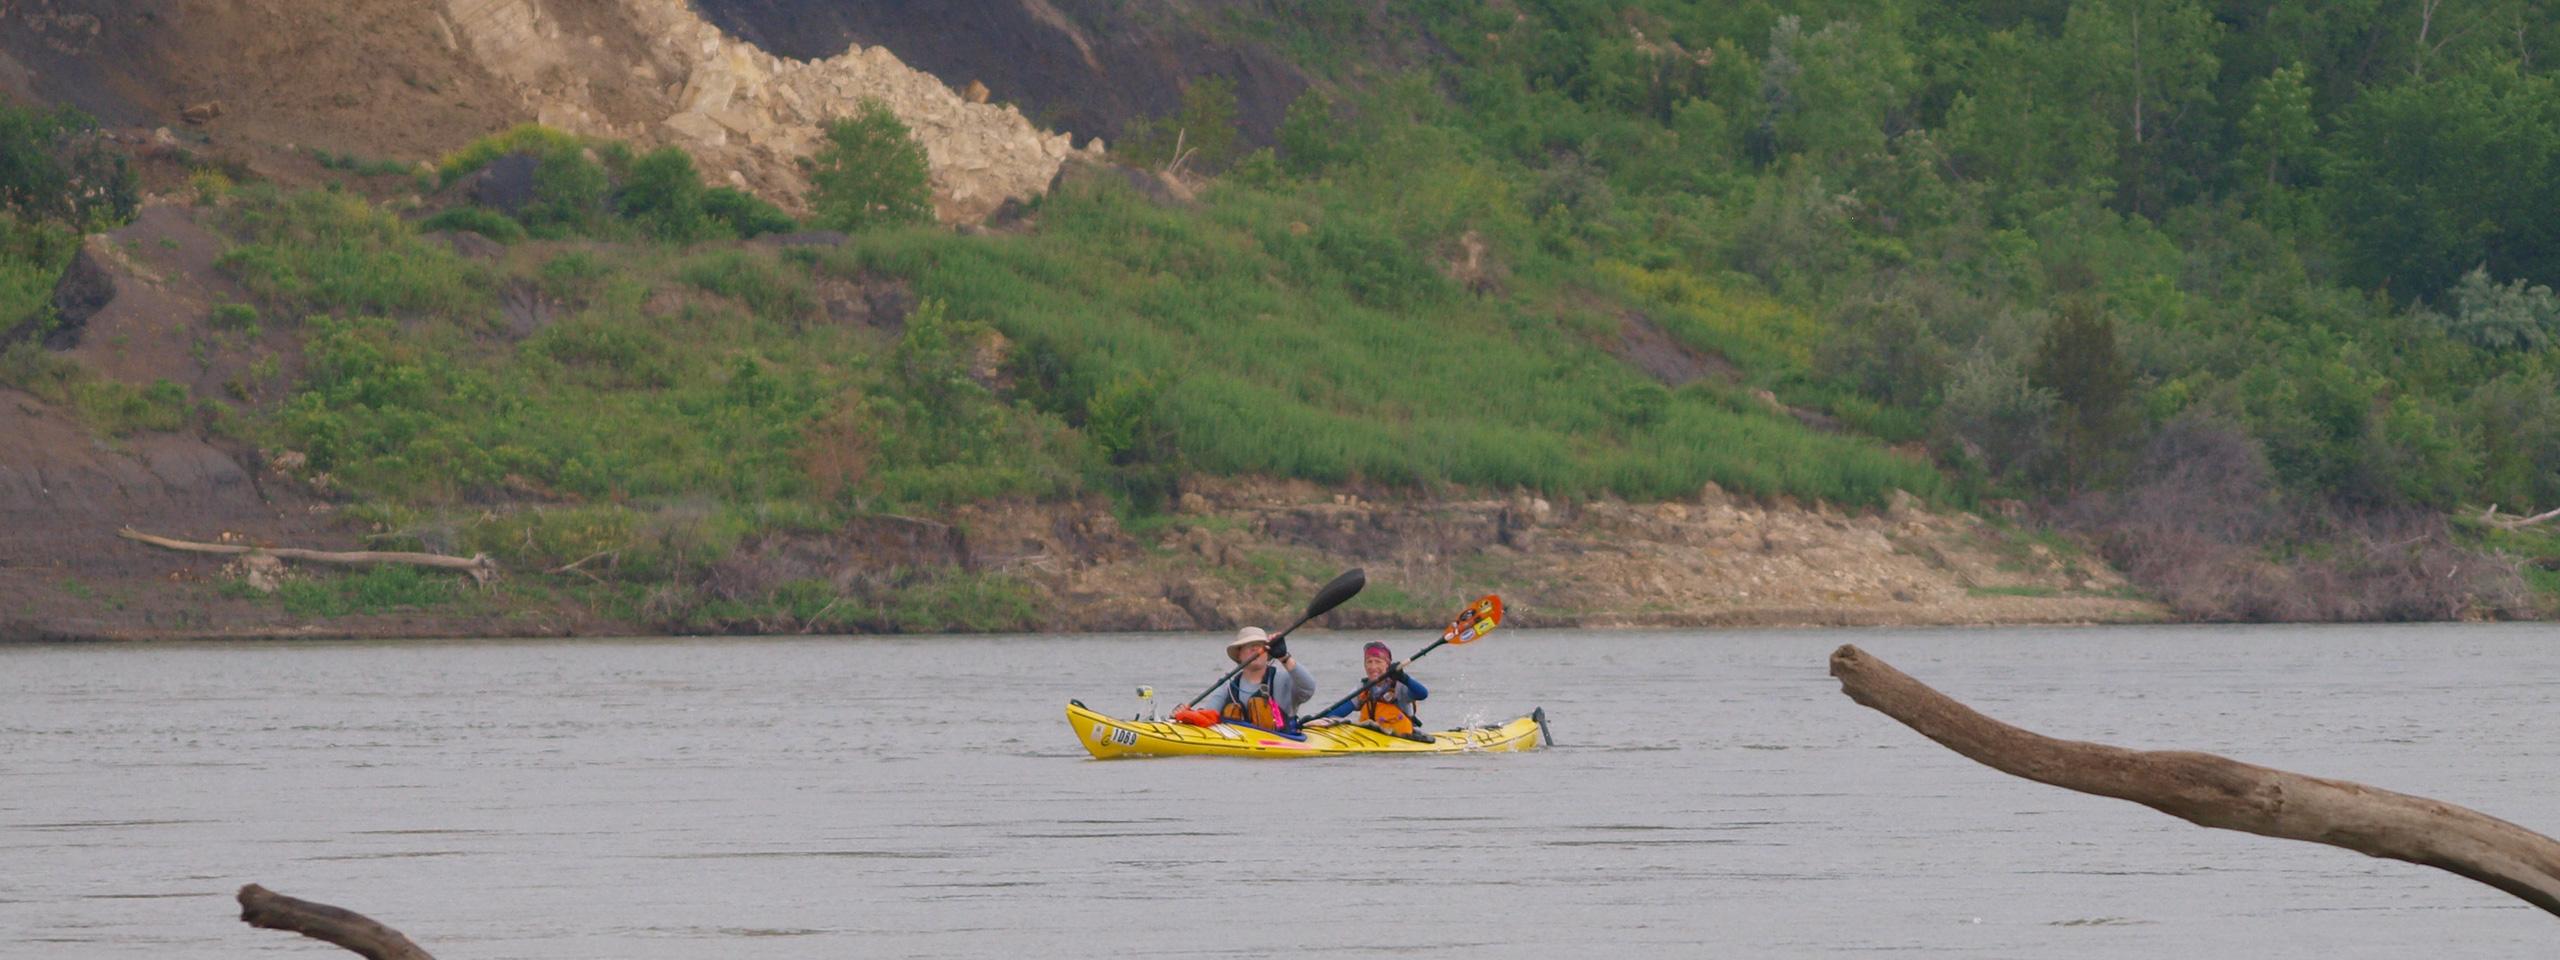 Canoeing and Kayaking - Missouri National Recreational River (U S